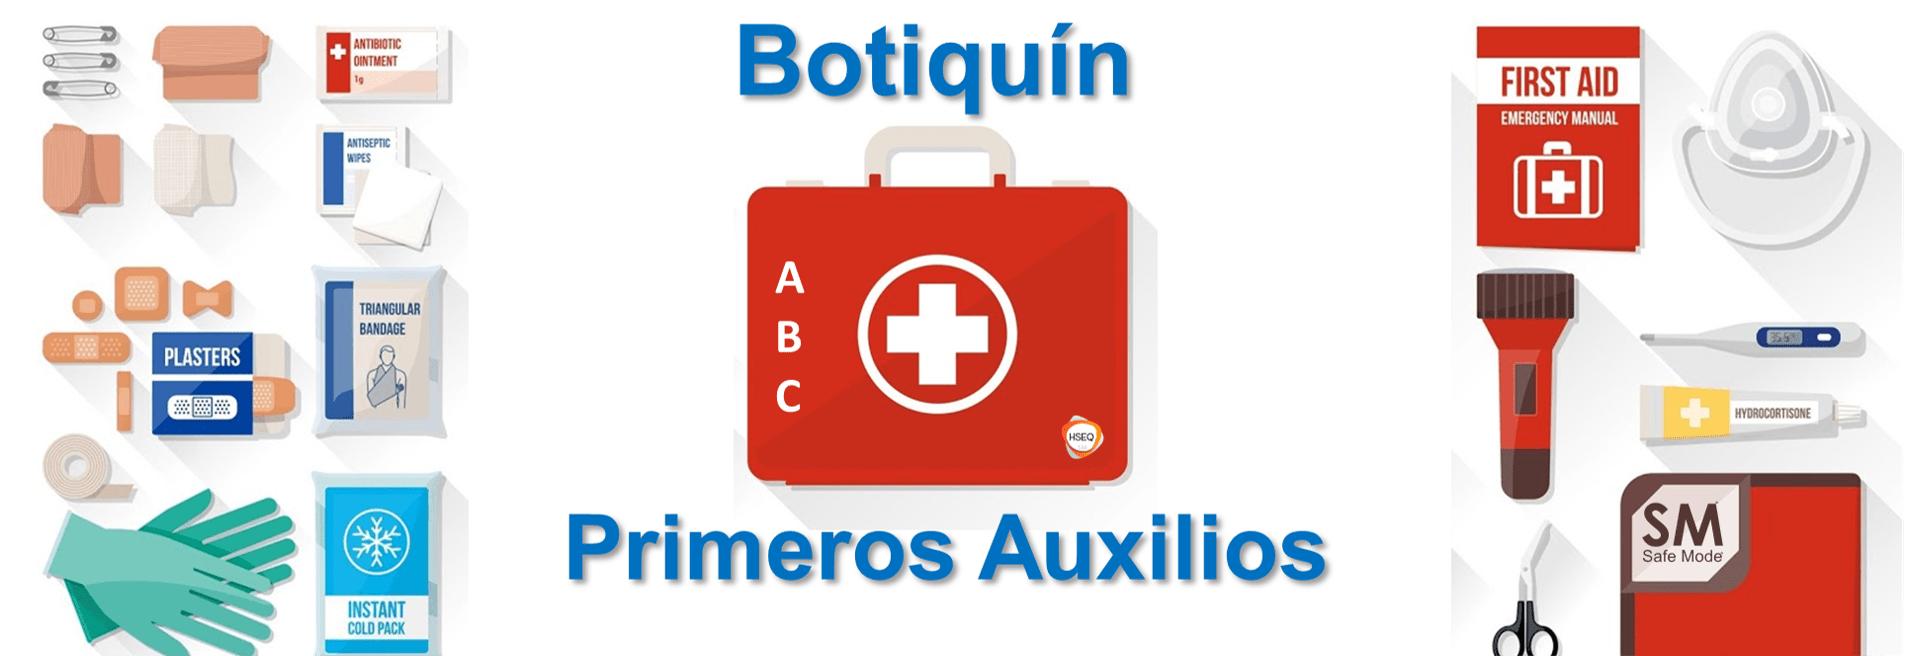 Todo sobre Botiquín de primeros auxilios